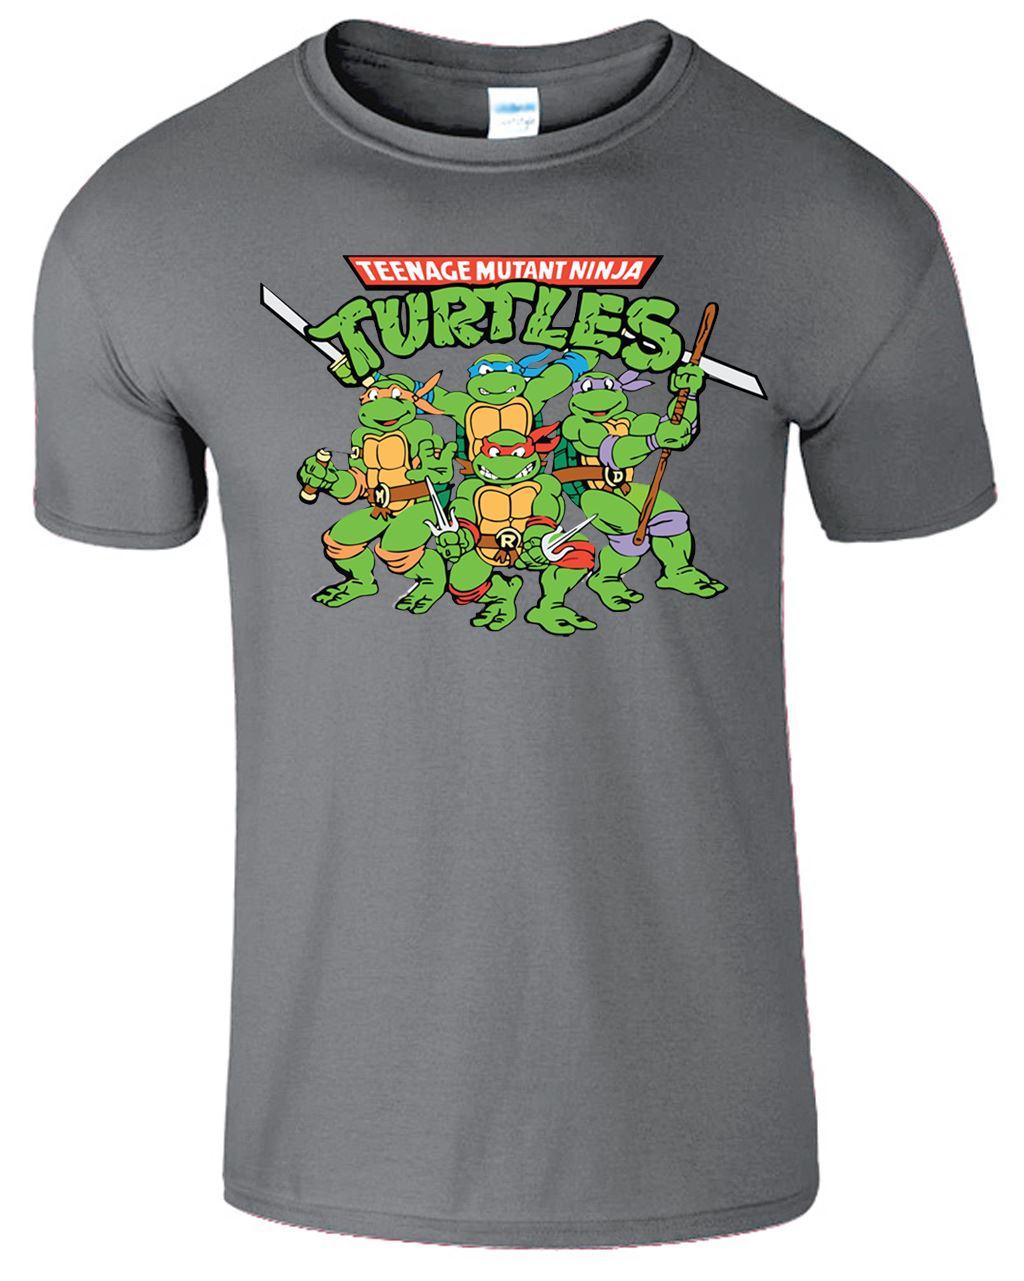 Teenage mutant ninja turtles mens t shirt tmnt retro for Turtle shirts for men